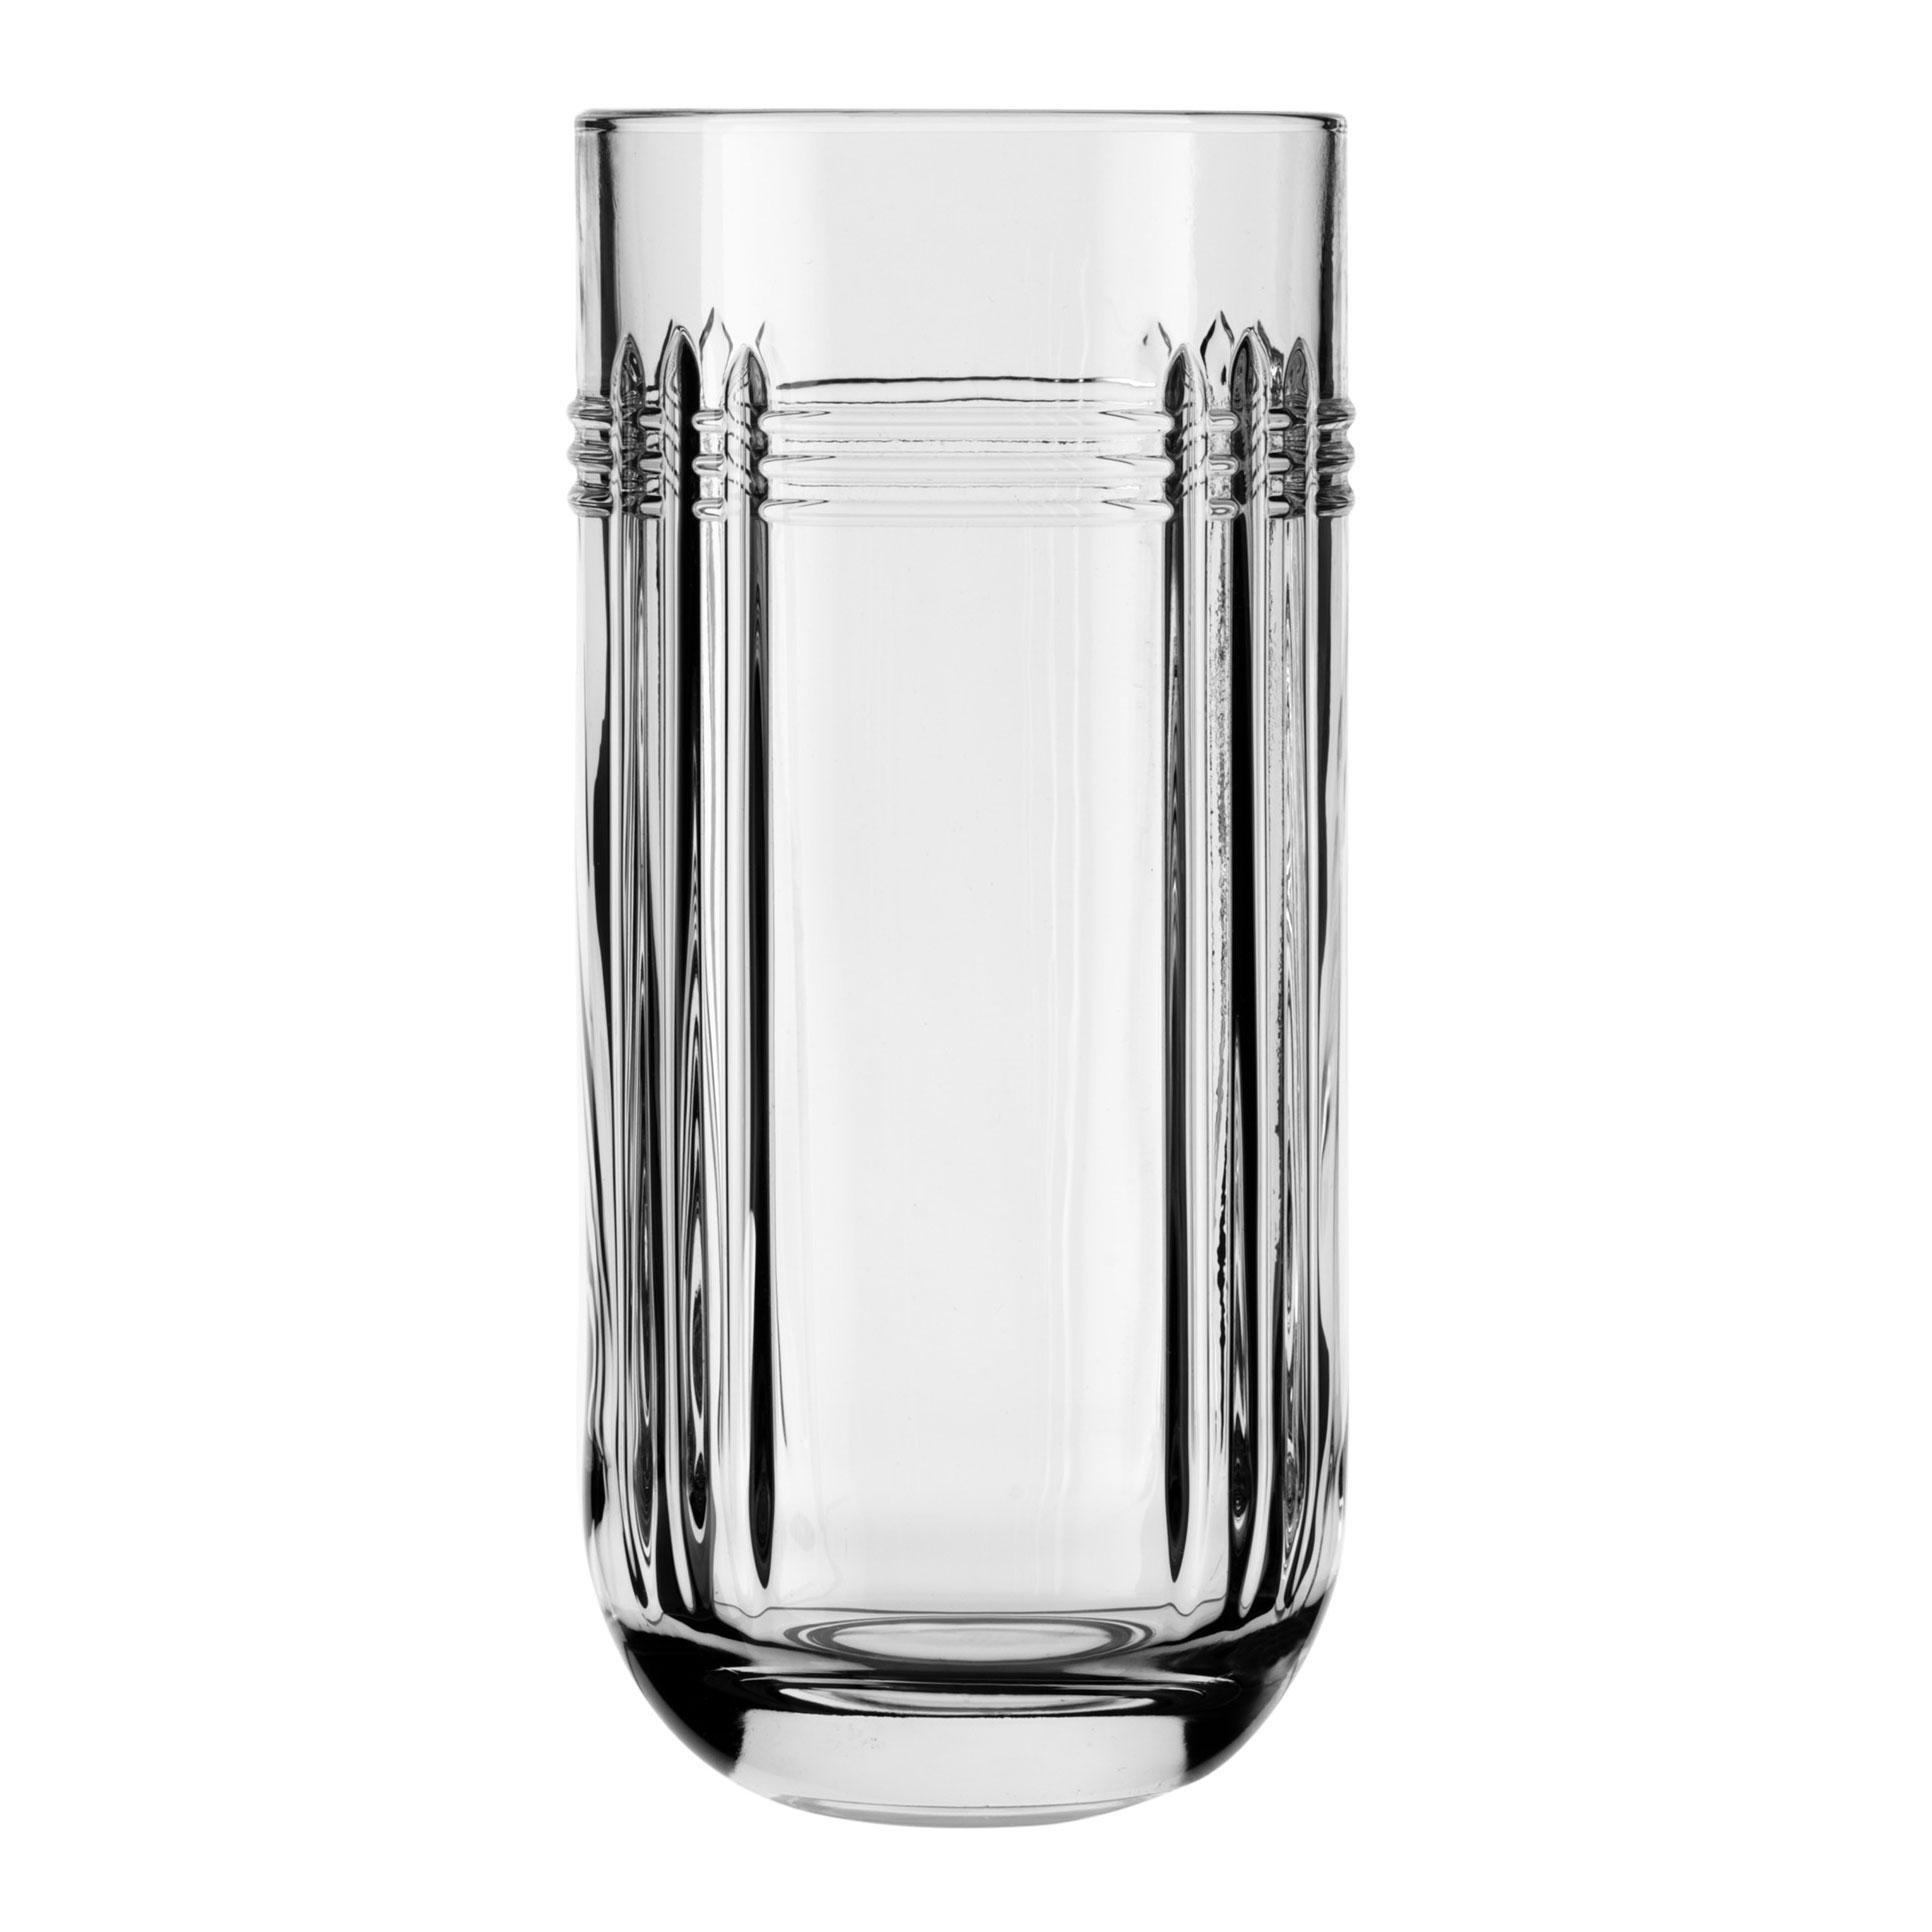 Libbey Glass 2970VCP35 glass, hi ball